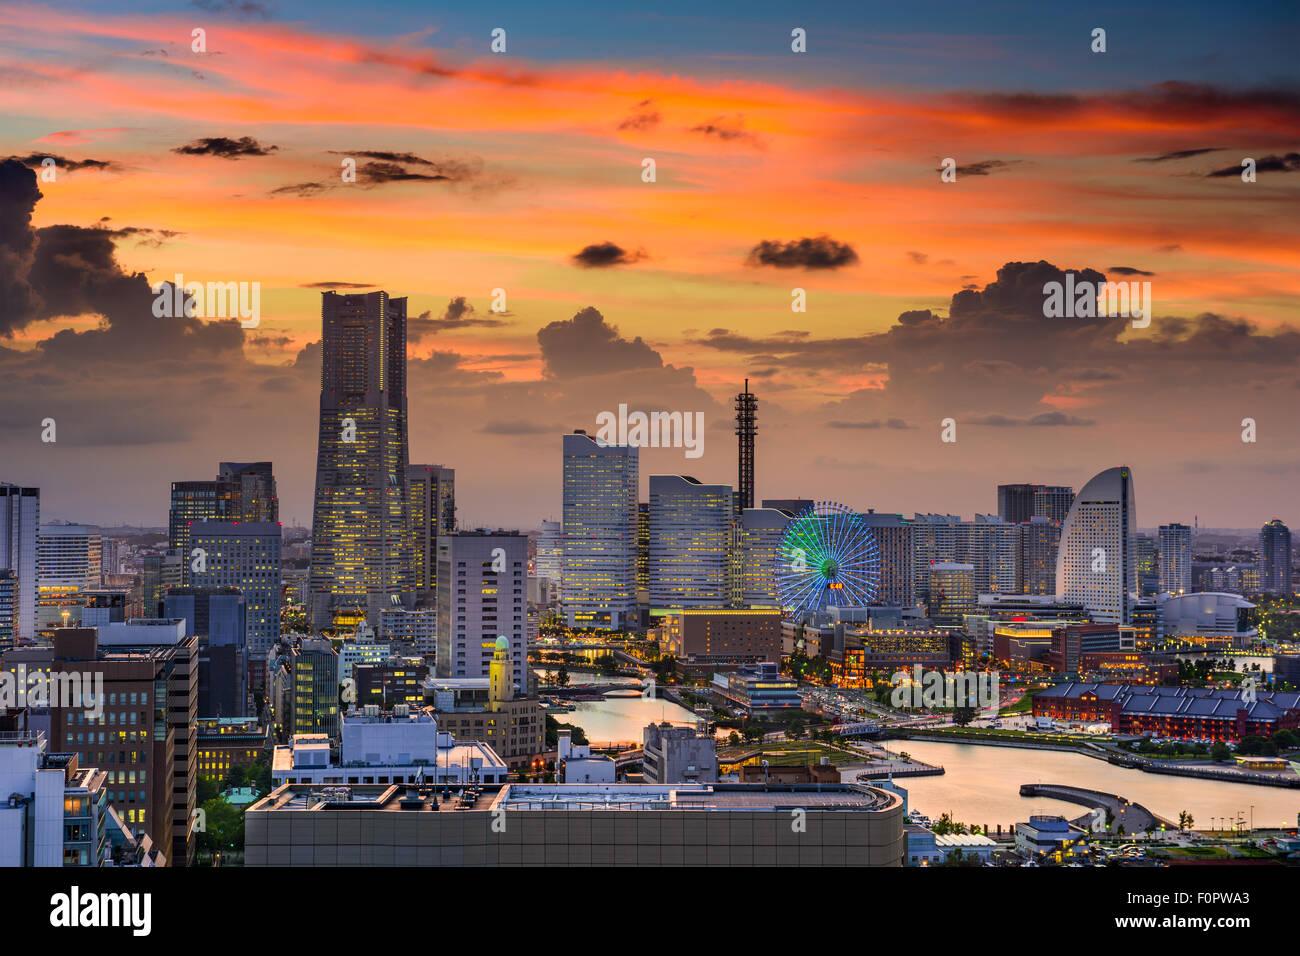 Yokohama, Japan cityscape of Minato Mirai District. - Stock Image